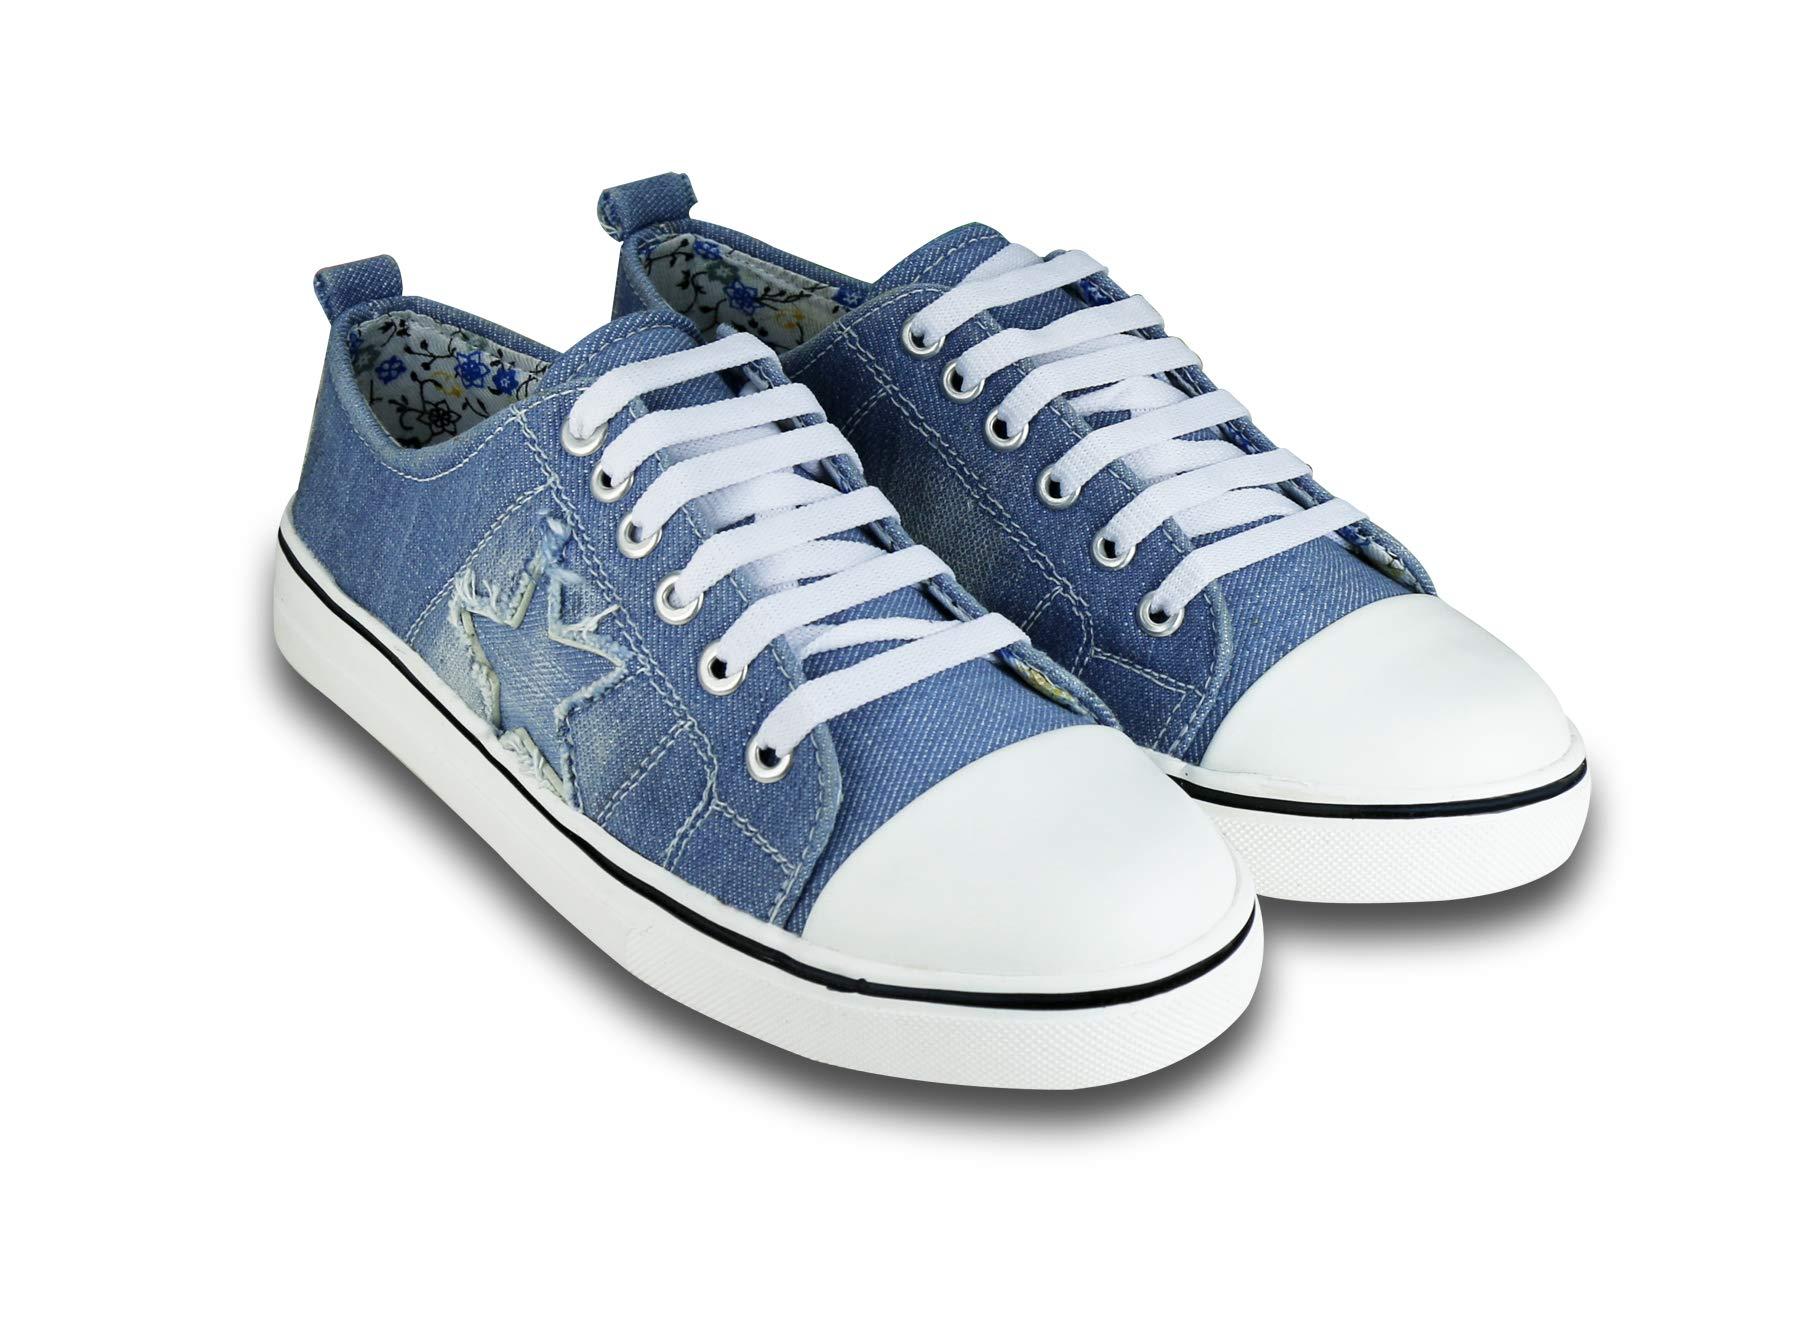 BEONZA Women's Denim Sneakers